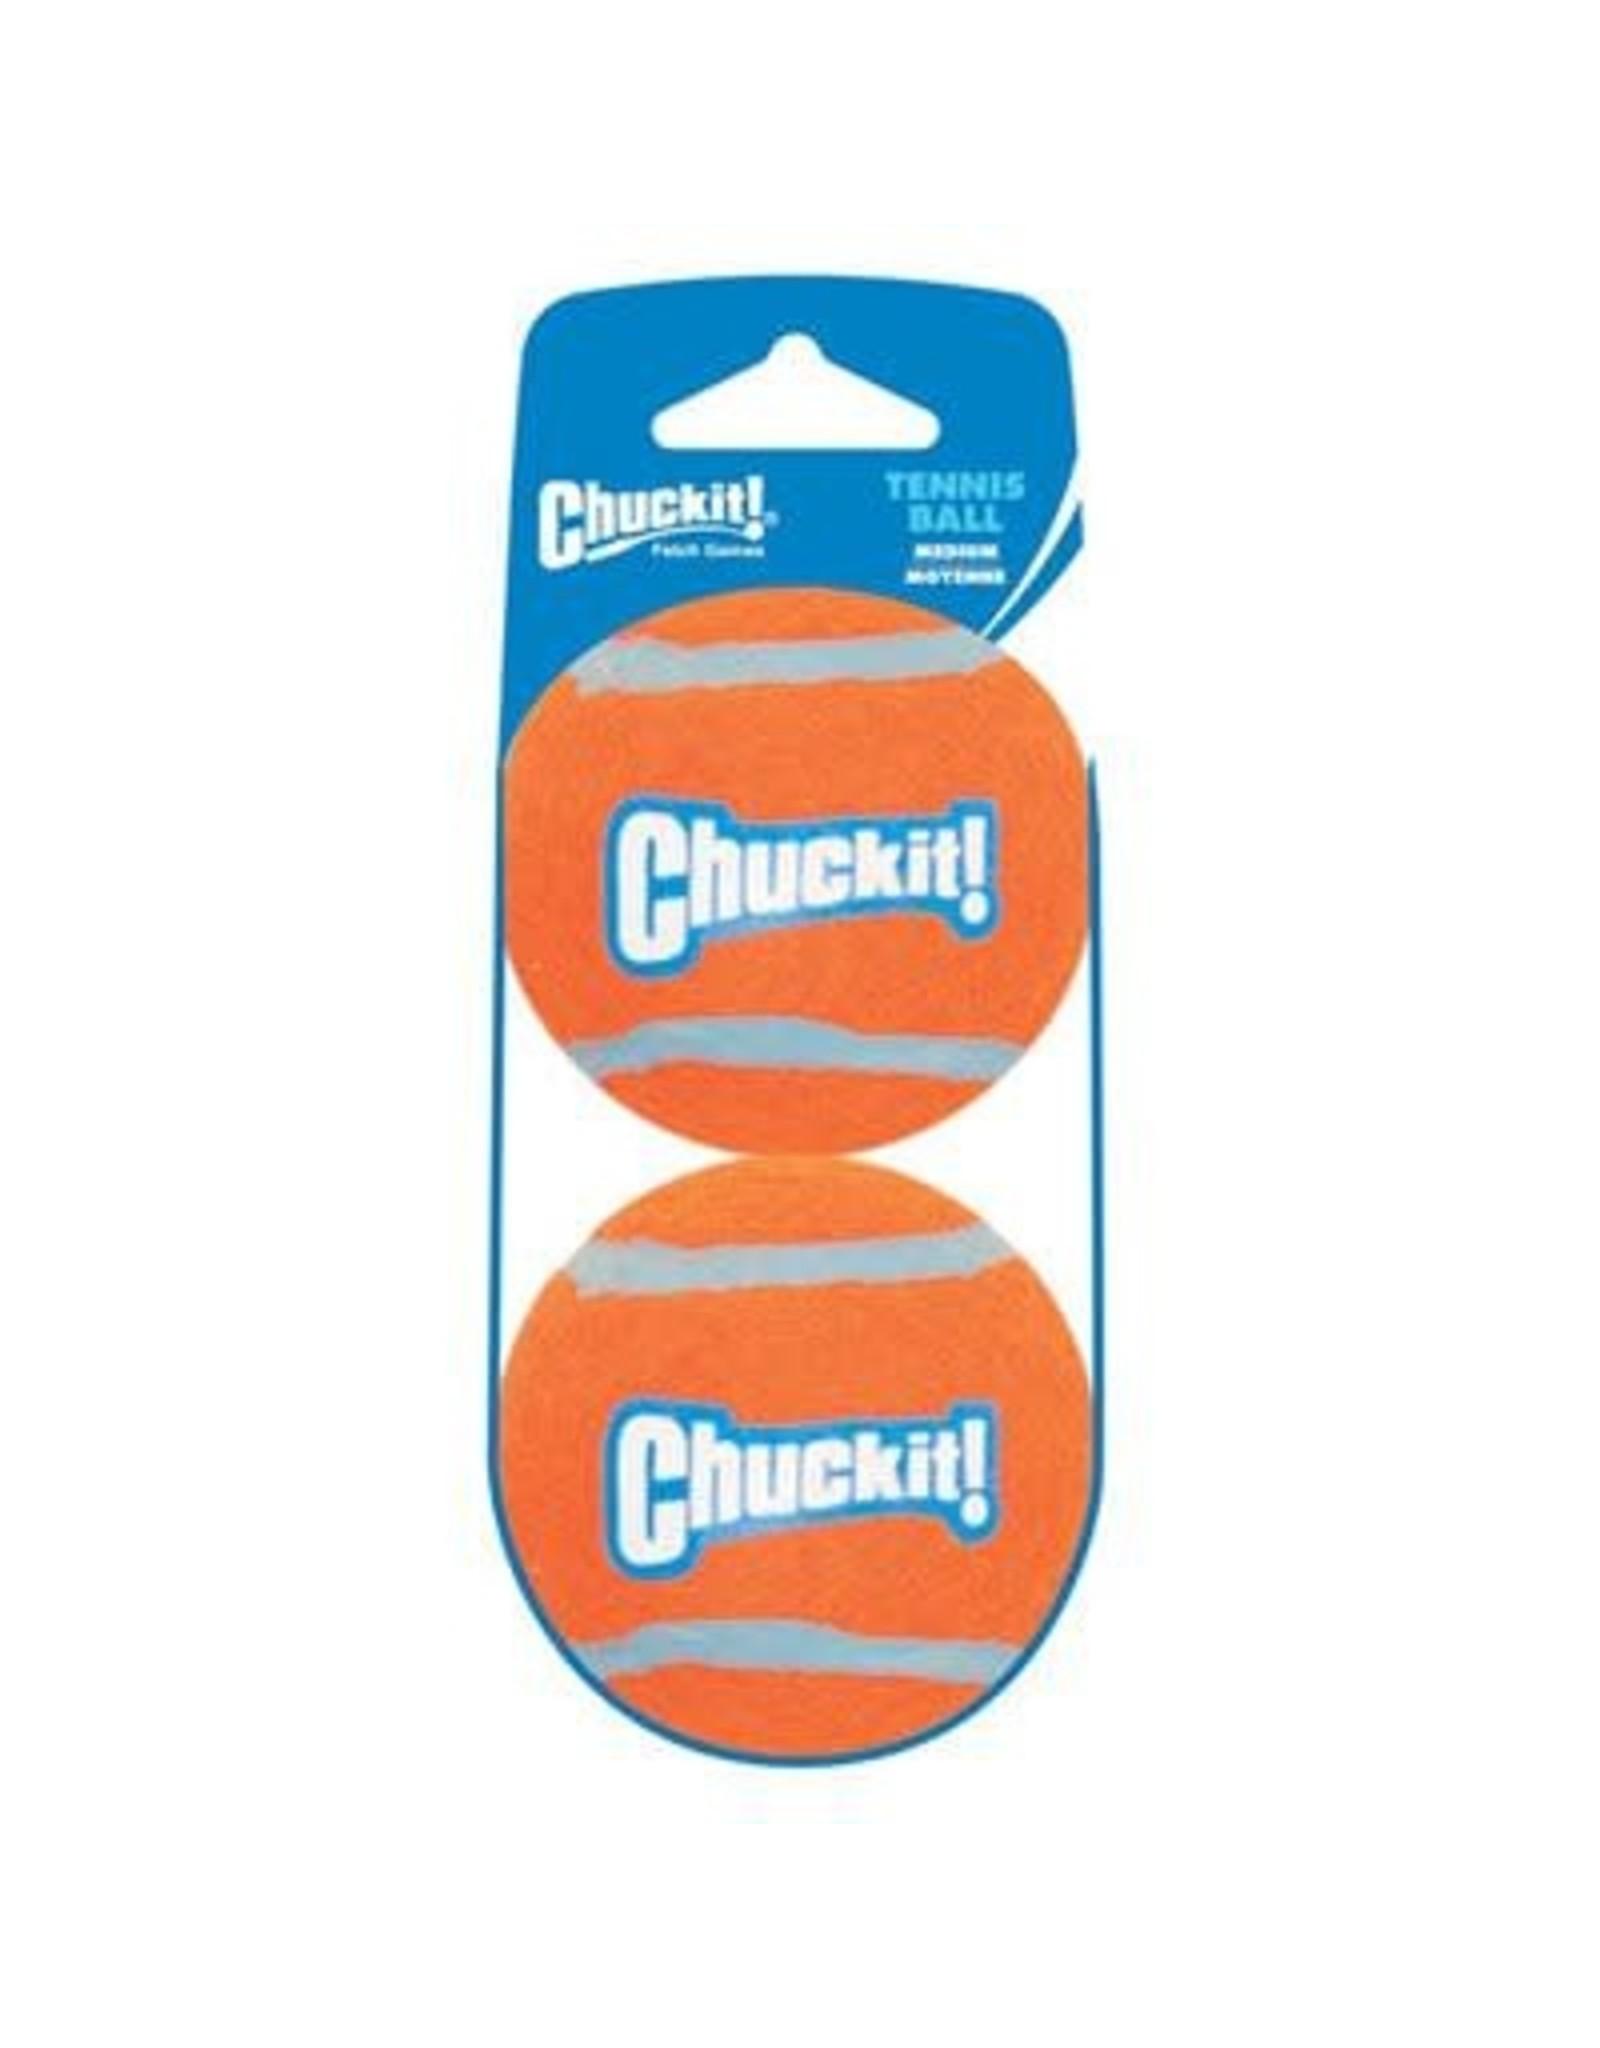 Chuck-It Chuck-It Tennis Ball Medium 2pk